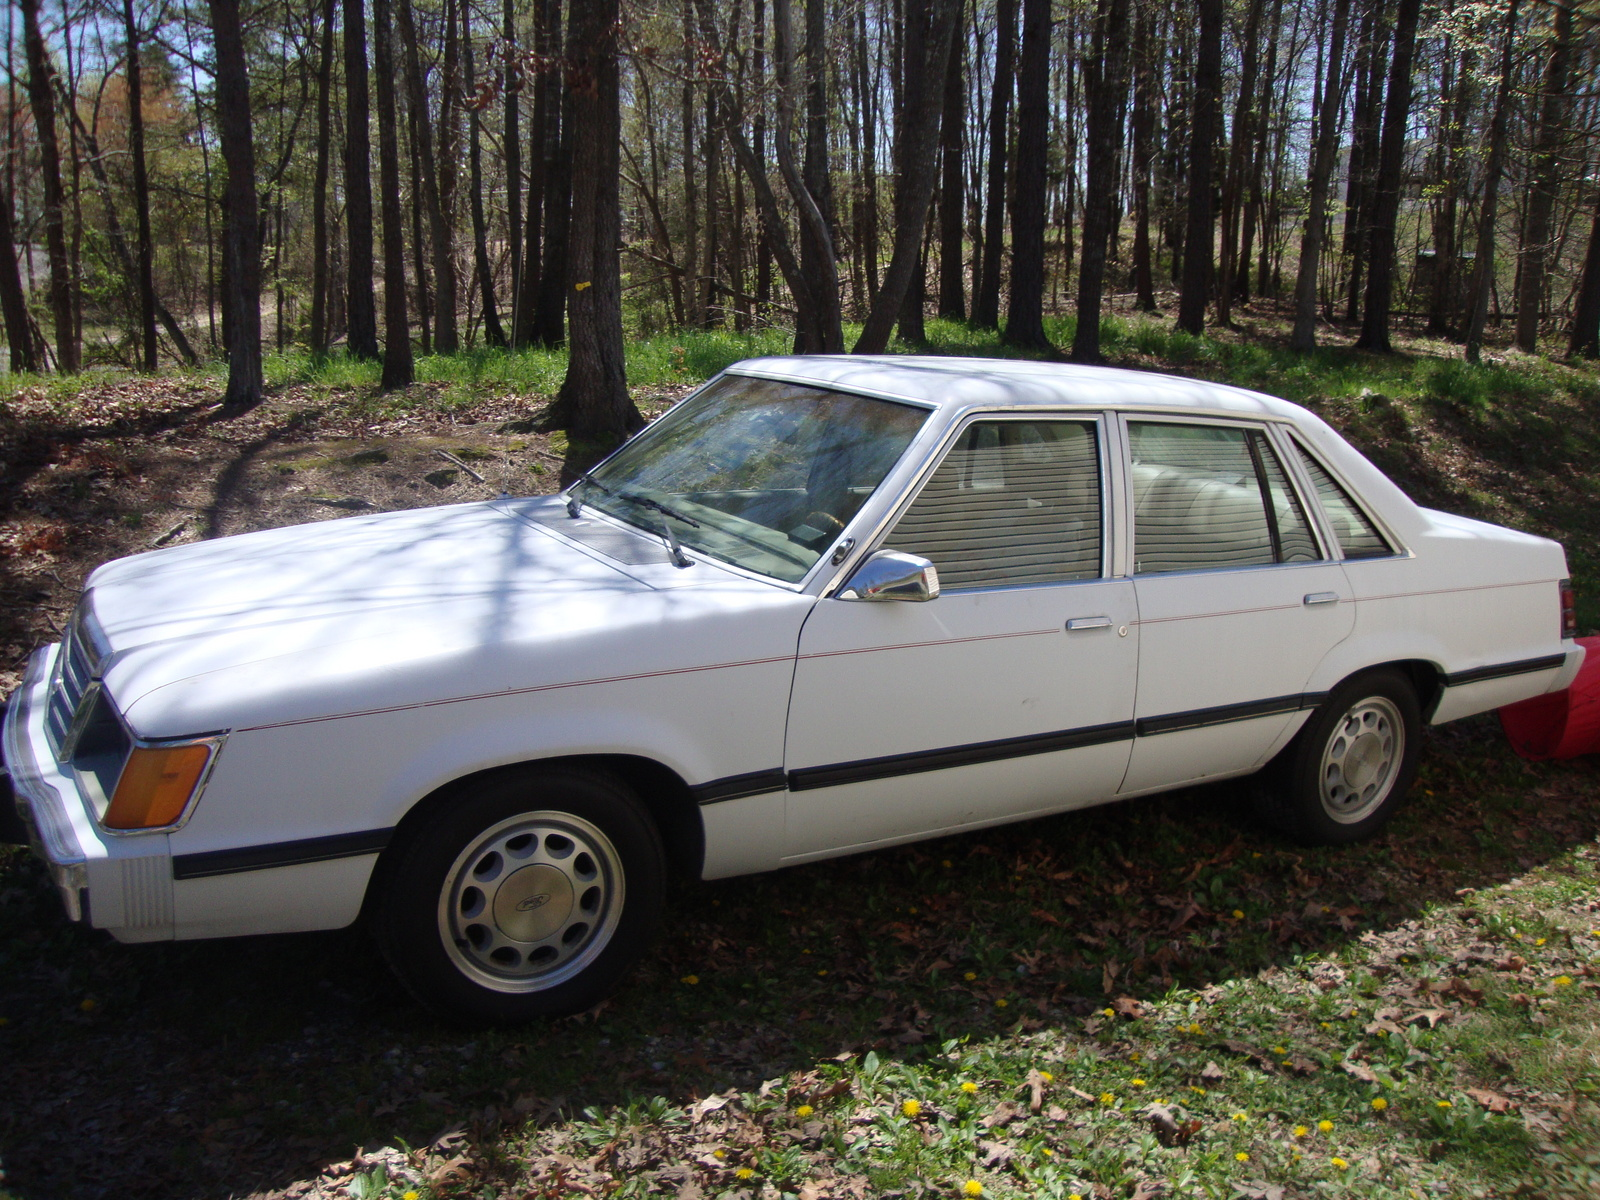 1976 Ford Granada For Sale 1985 Ford LTD - Overview - CarGurus